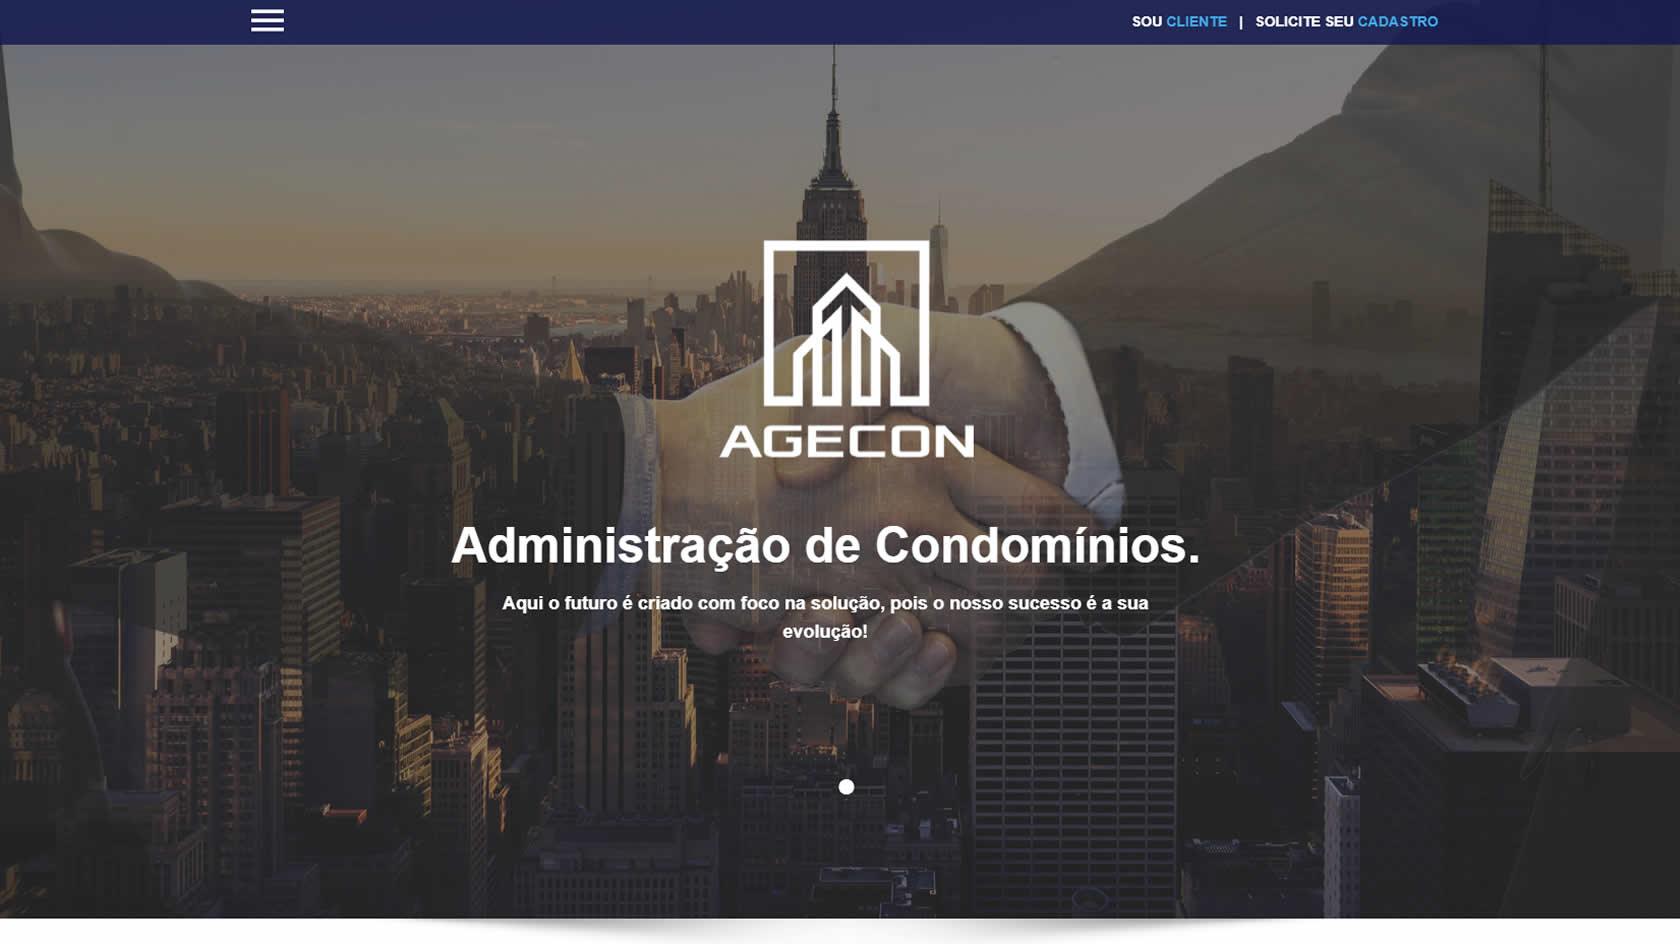 Agecon SC